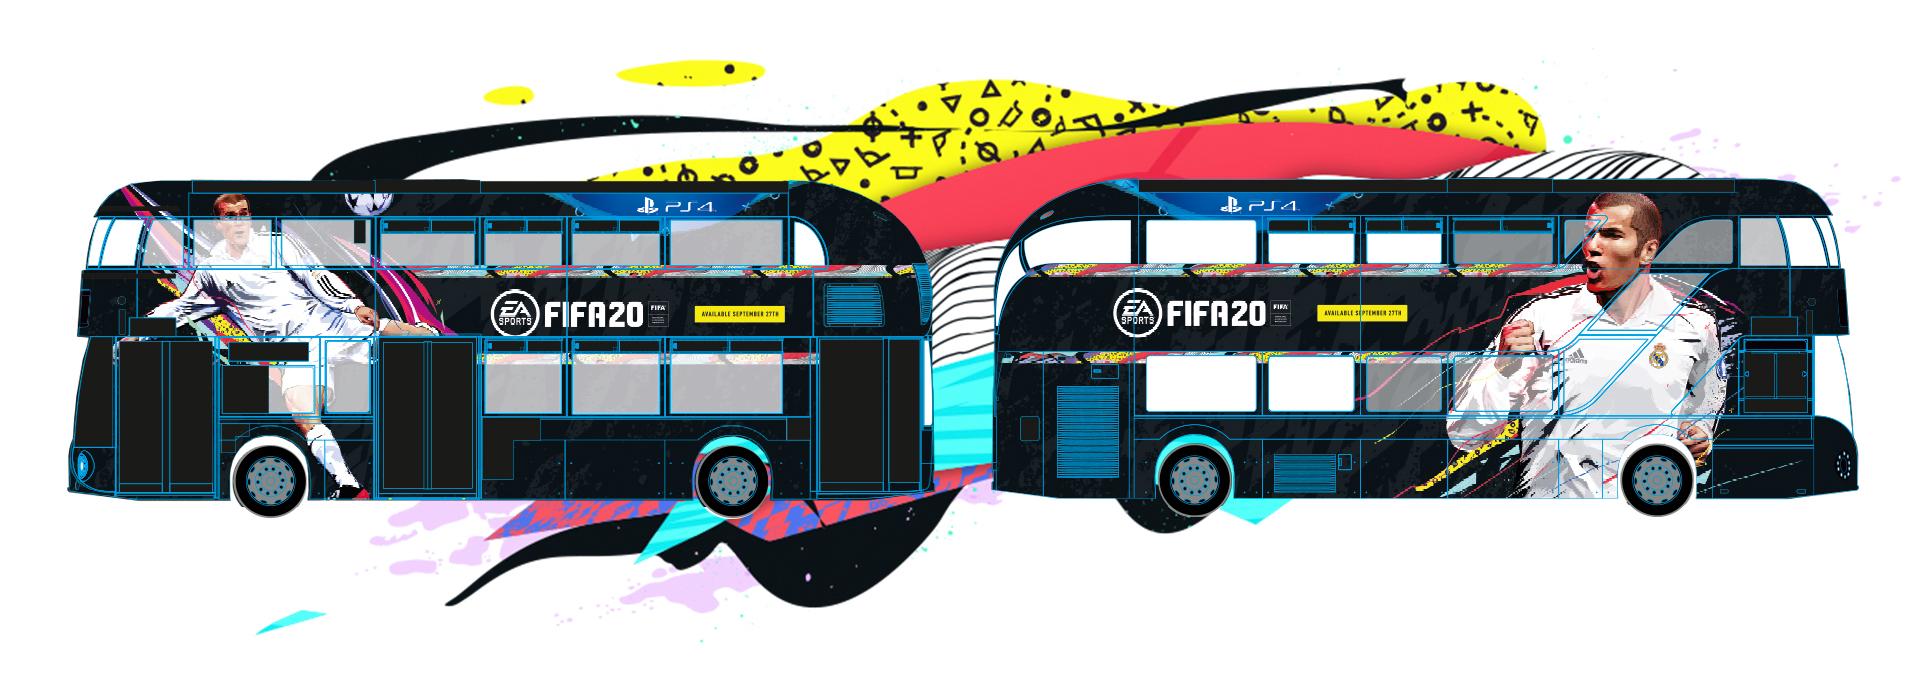 fifa-20-video-game-artwork